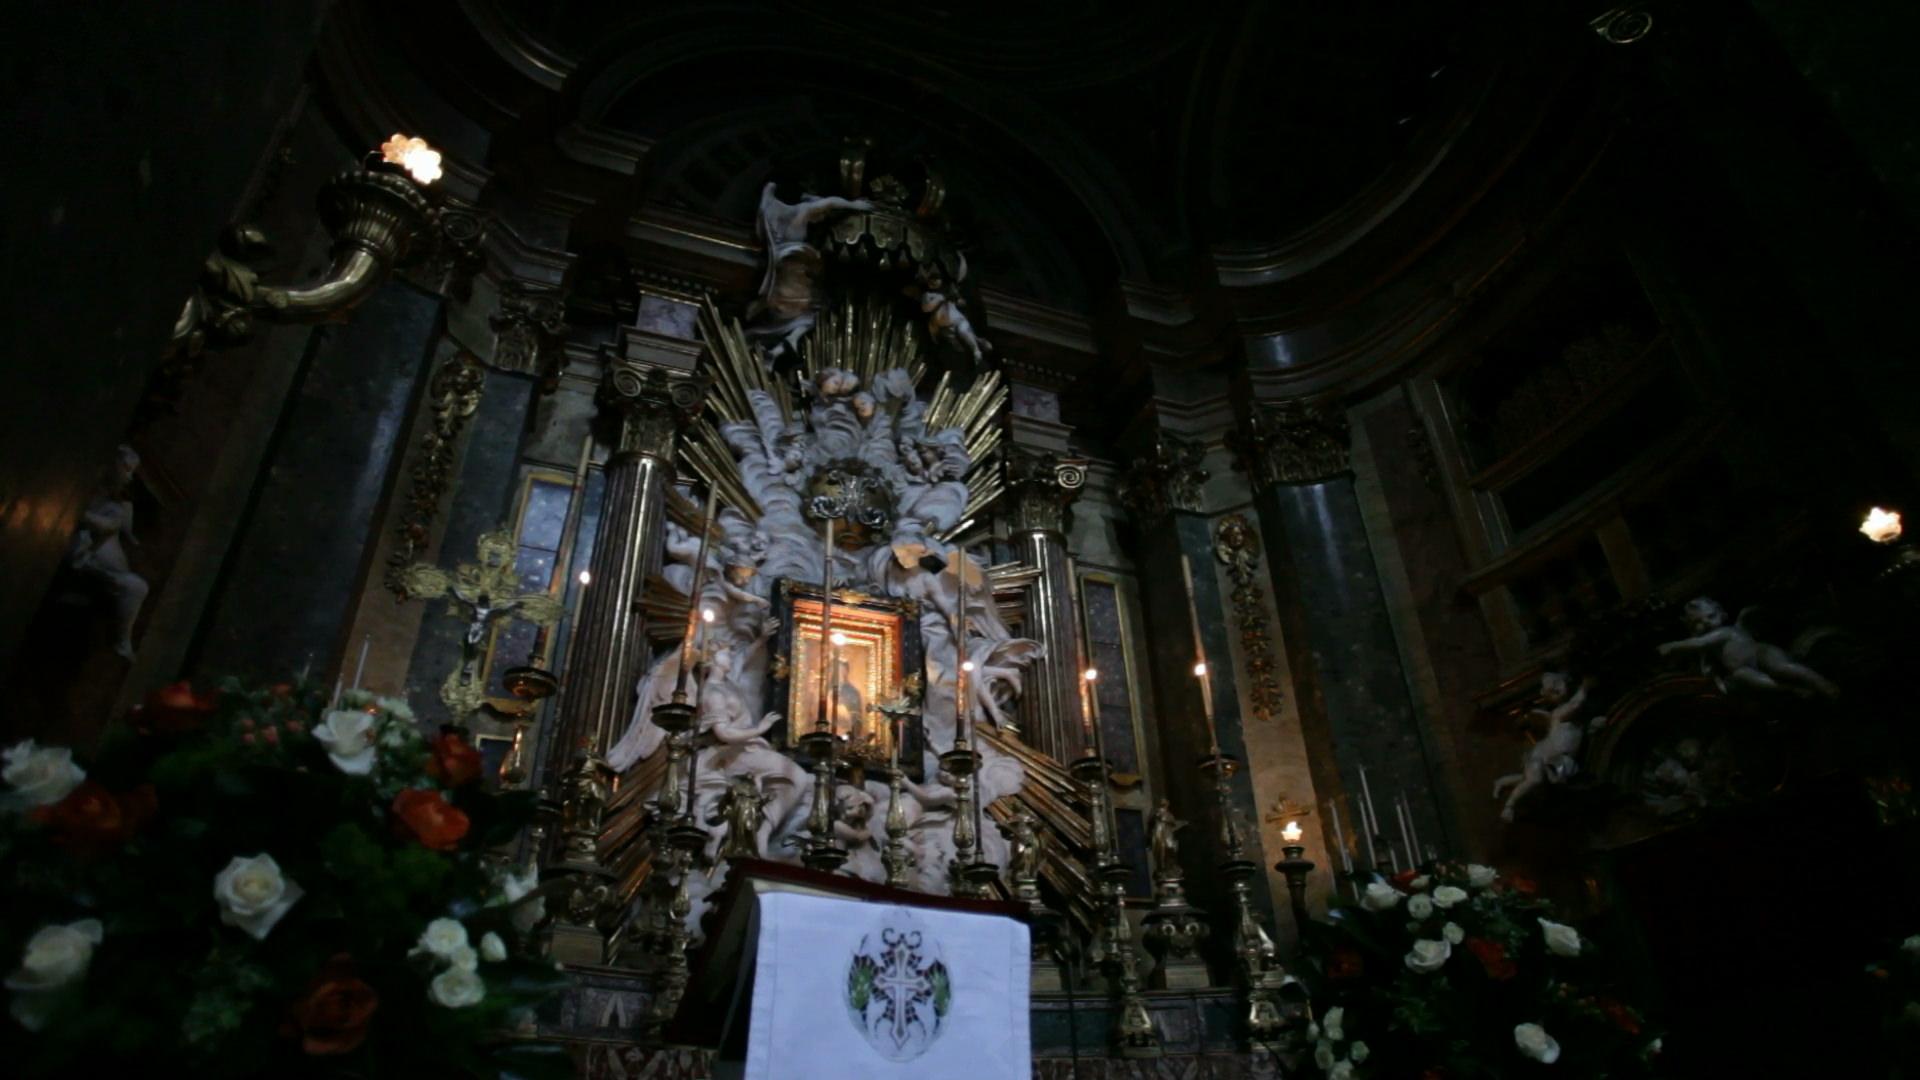 wedding rome galleria cardinale00002.jpeg